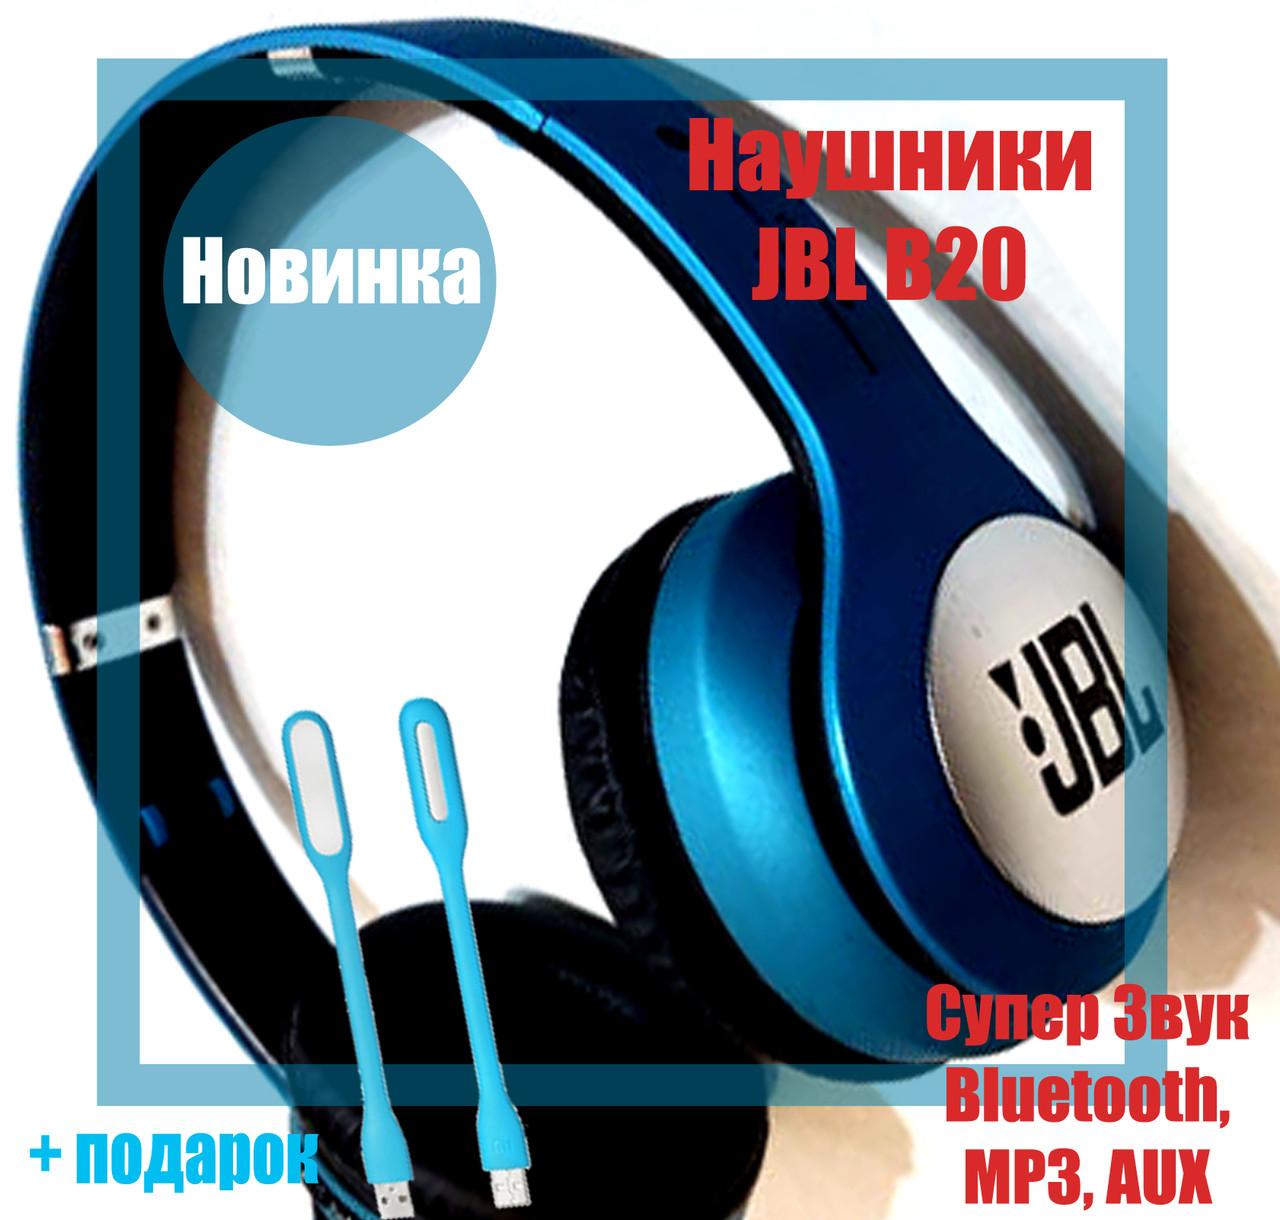 Наушники JBL В20 Wireless Bluetooth + MP3 + FM радио (чистый звук) QualittiReplica